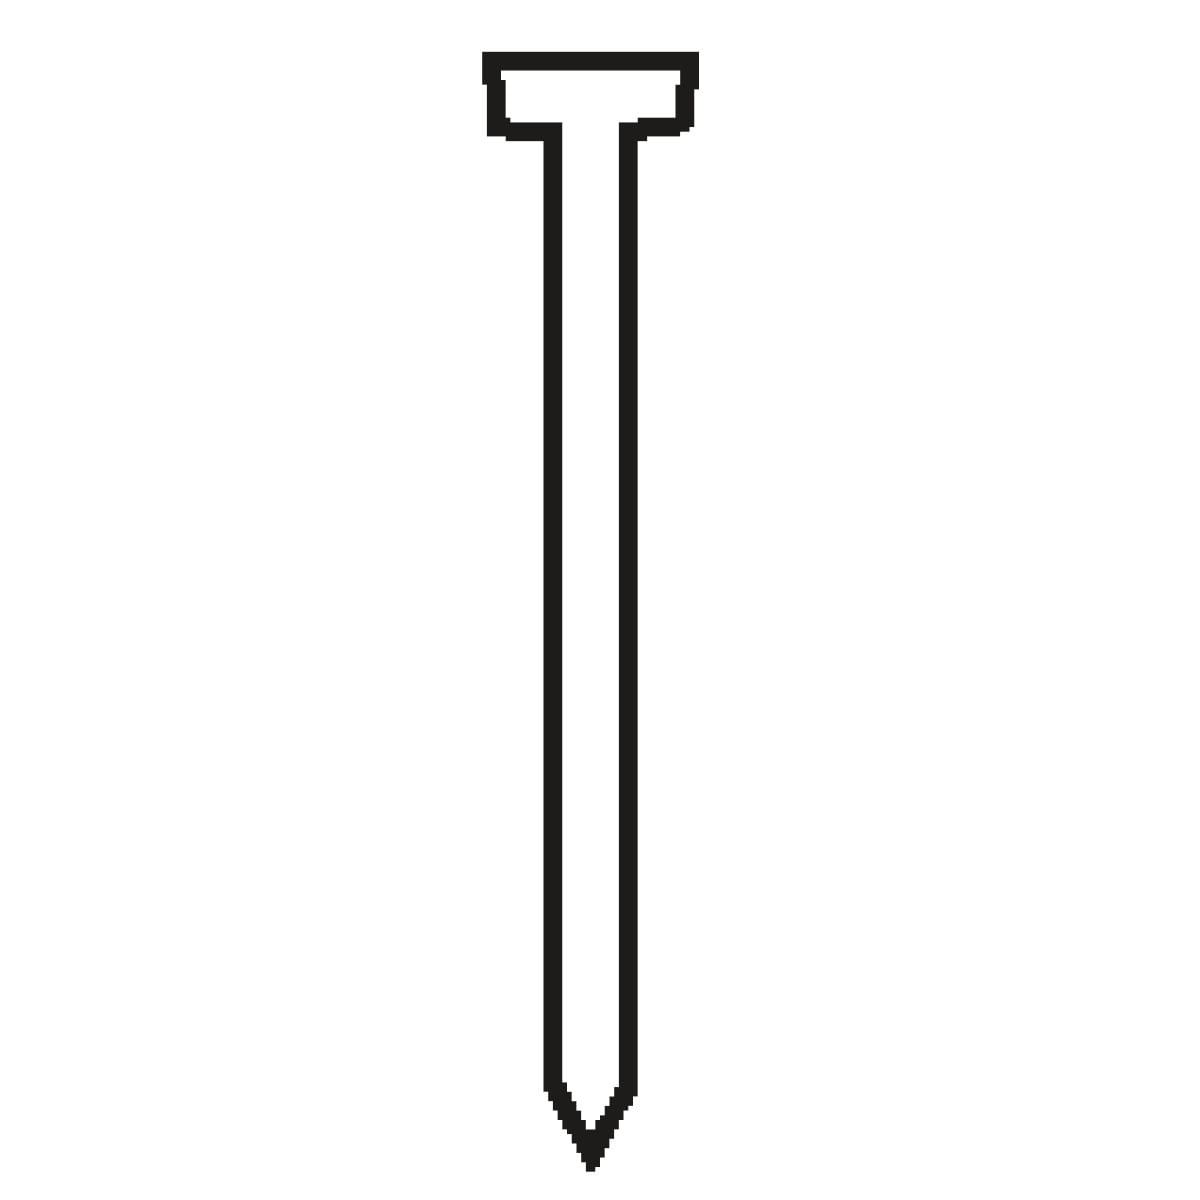 stauchkopfnägel typ f 15 mm (ve 5.000 stck) - stauchkopfnägel typ f